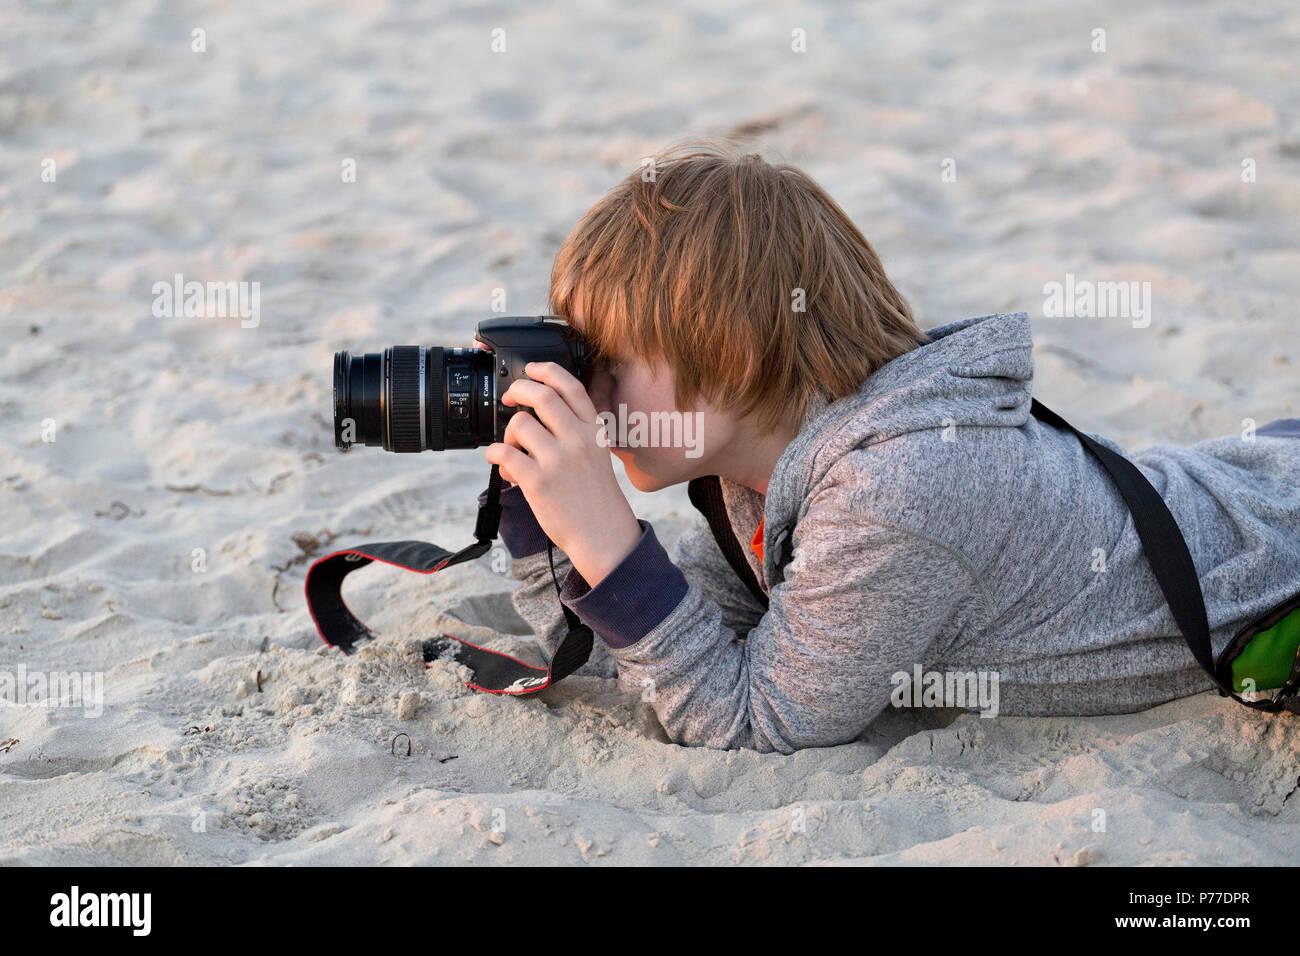 young boy taking photos at a beach - Stock Image